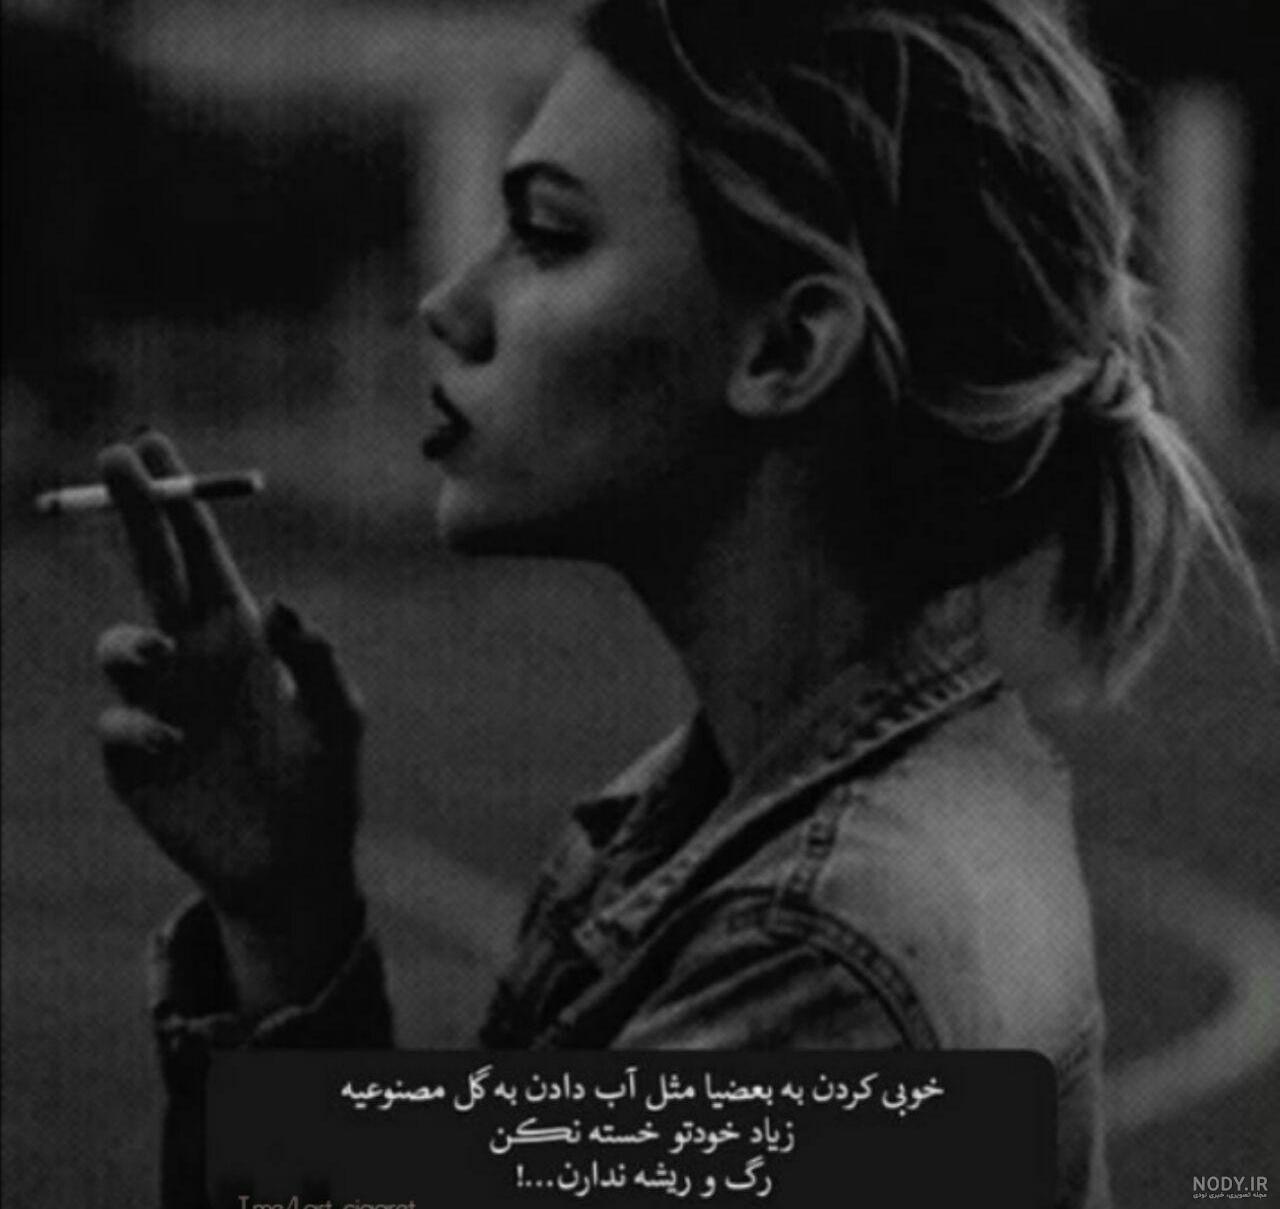 غمگین عکس پروفایل سیگار